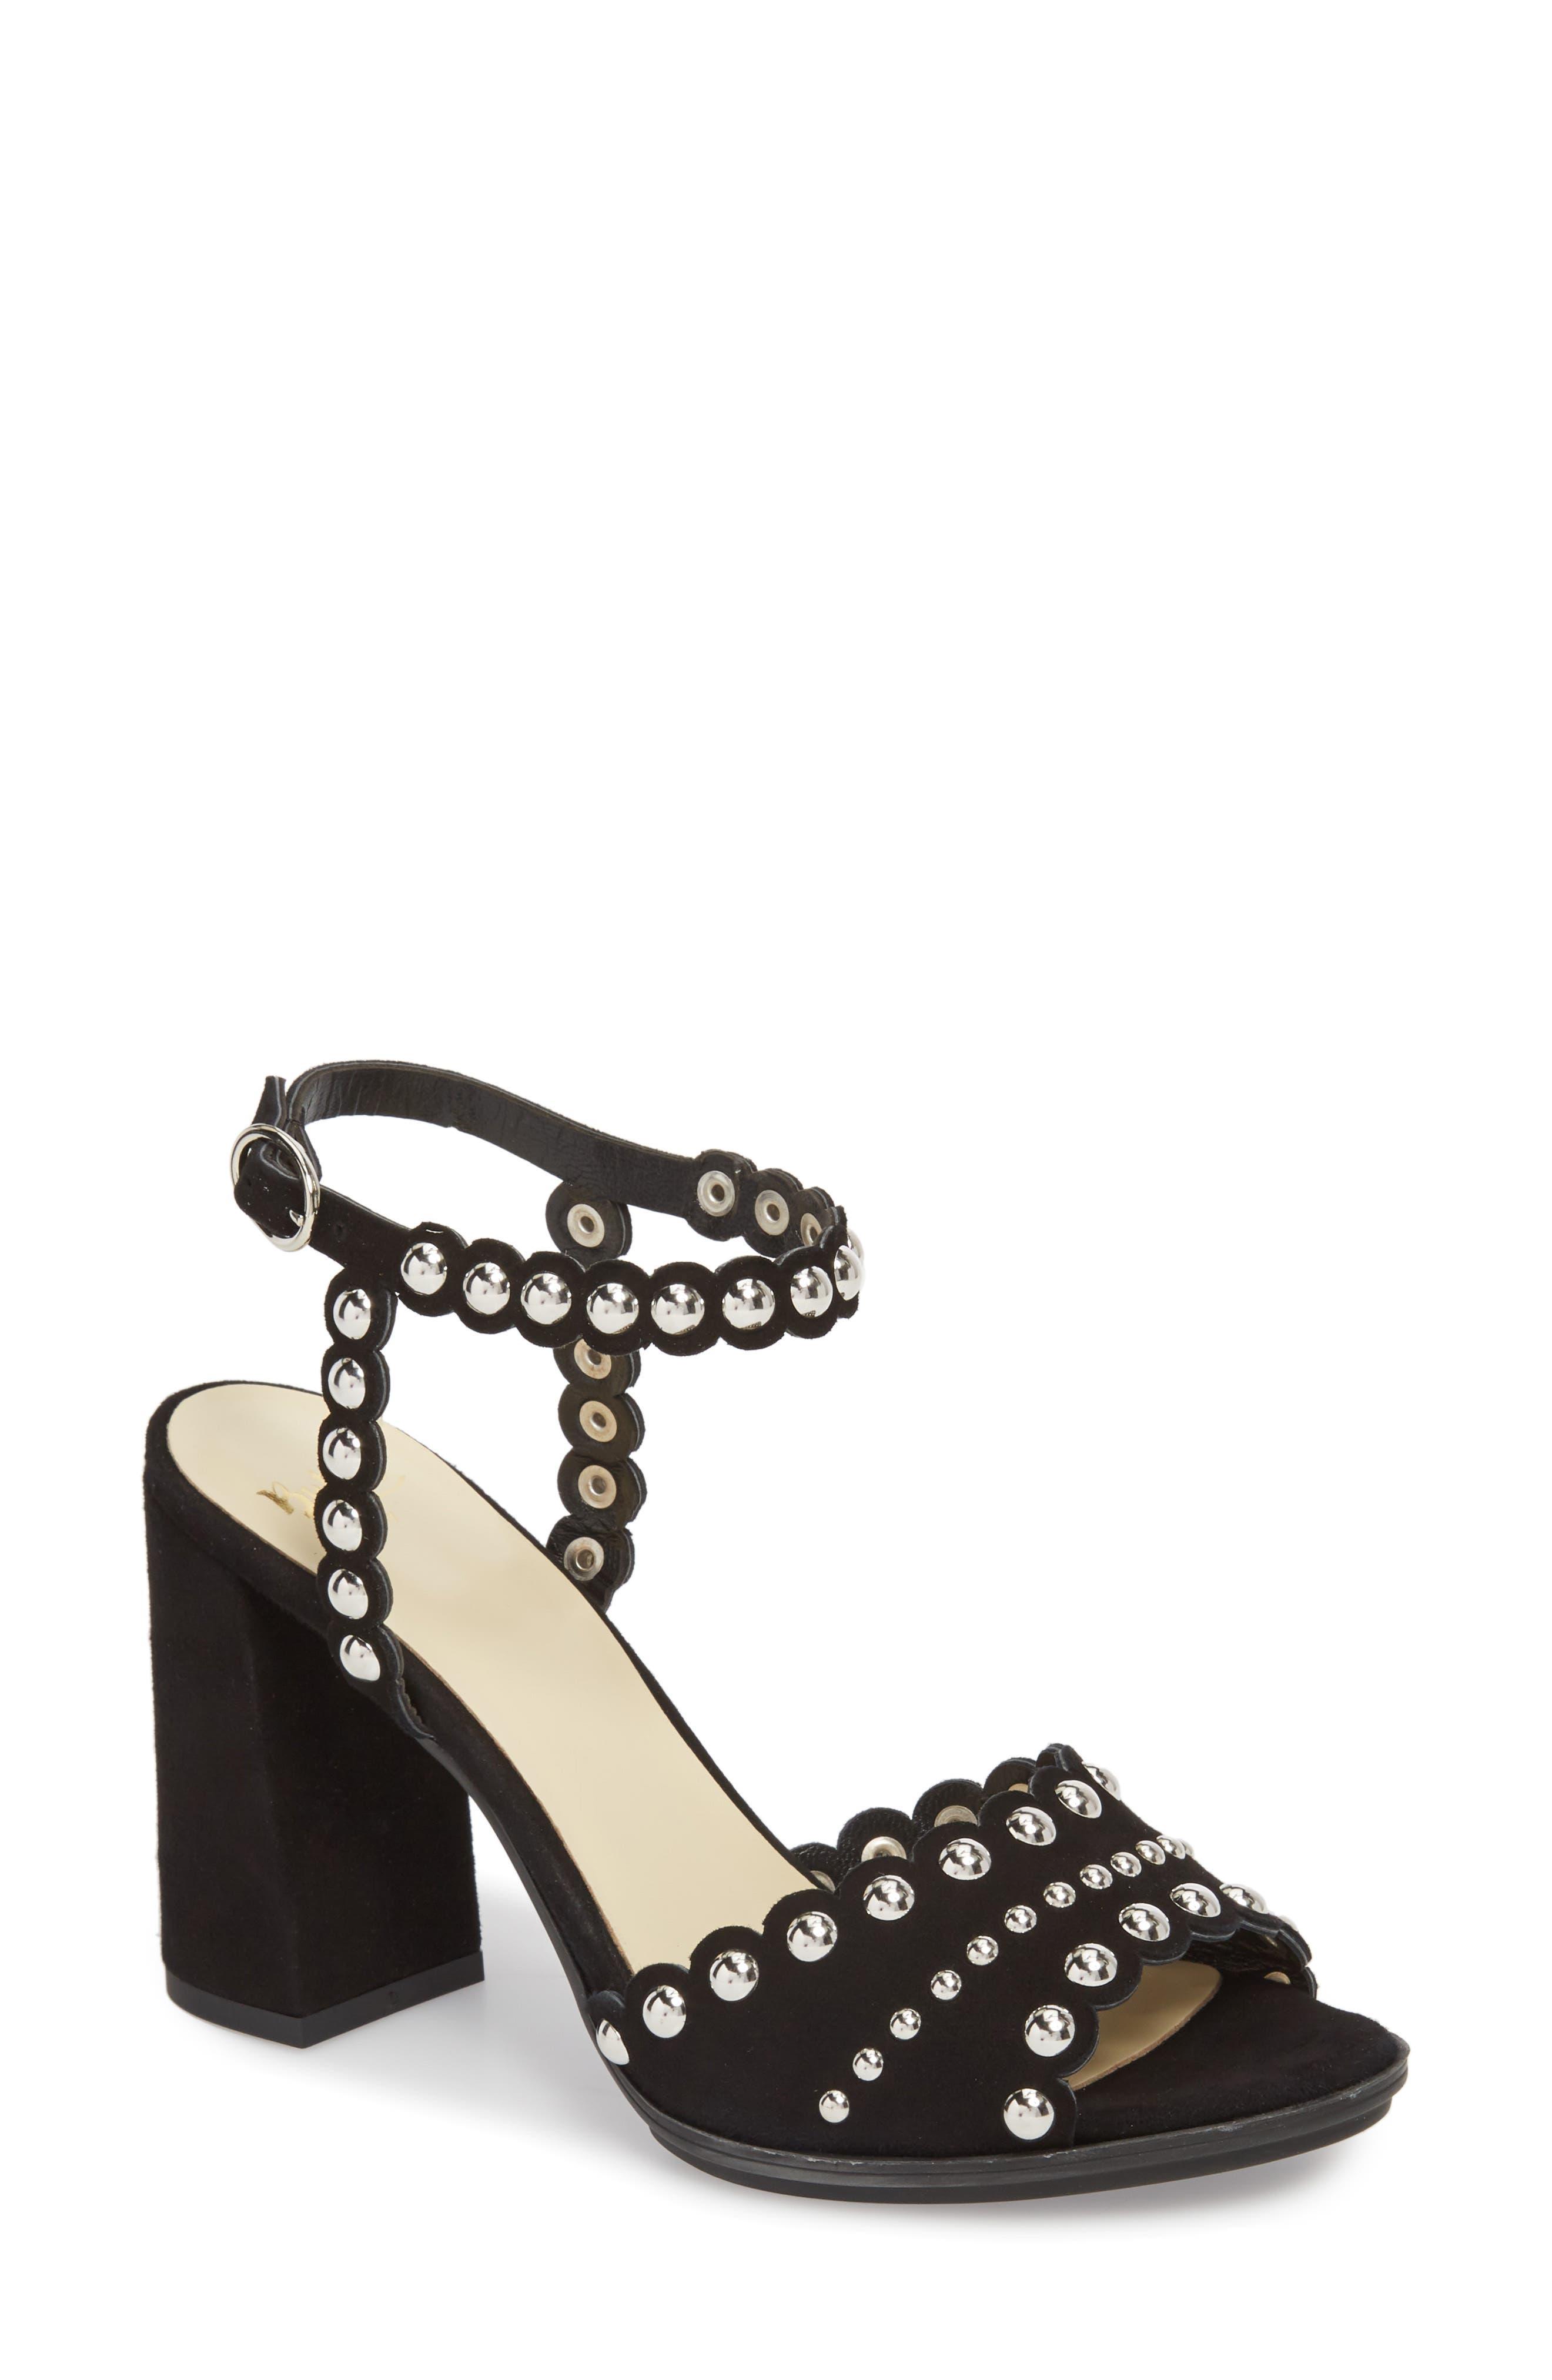 Butter Hetty Studded Ankle Strap Sandal,                             Main thumbnail 1, color,                             001